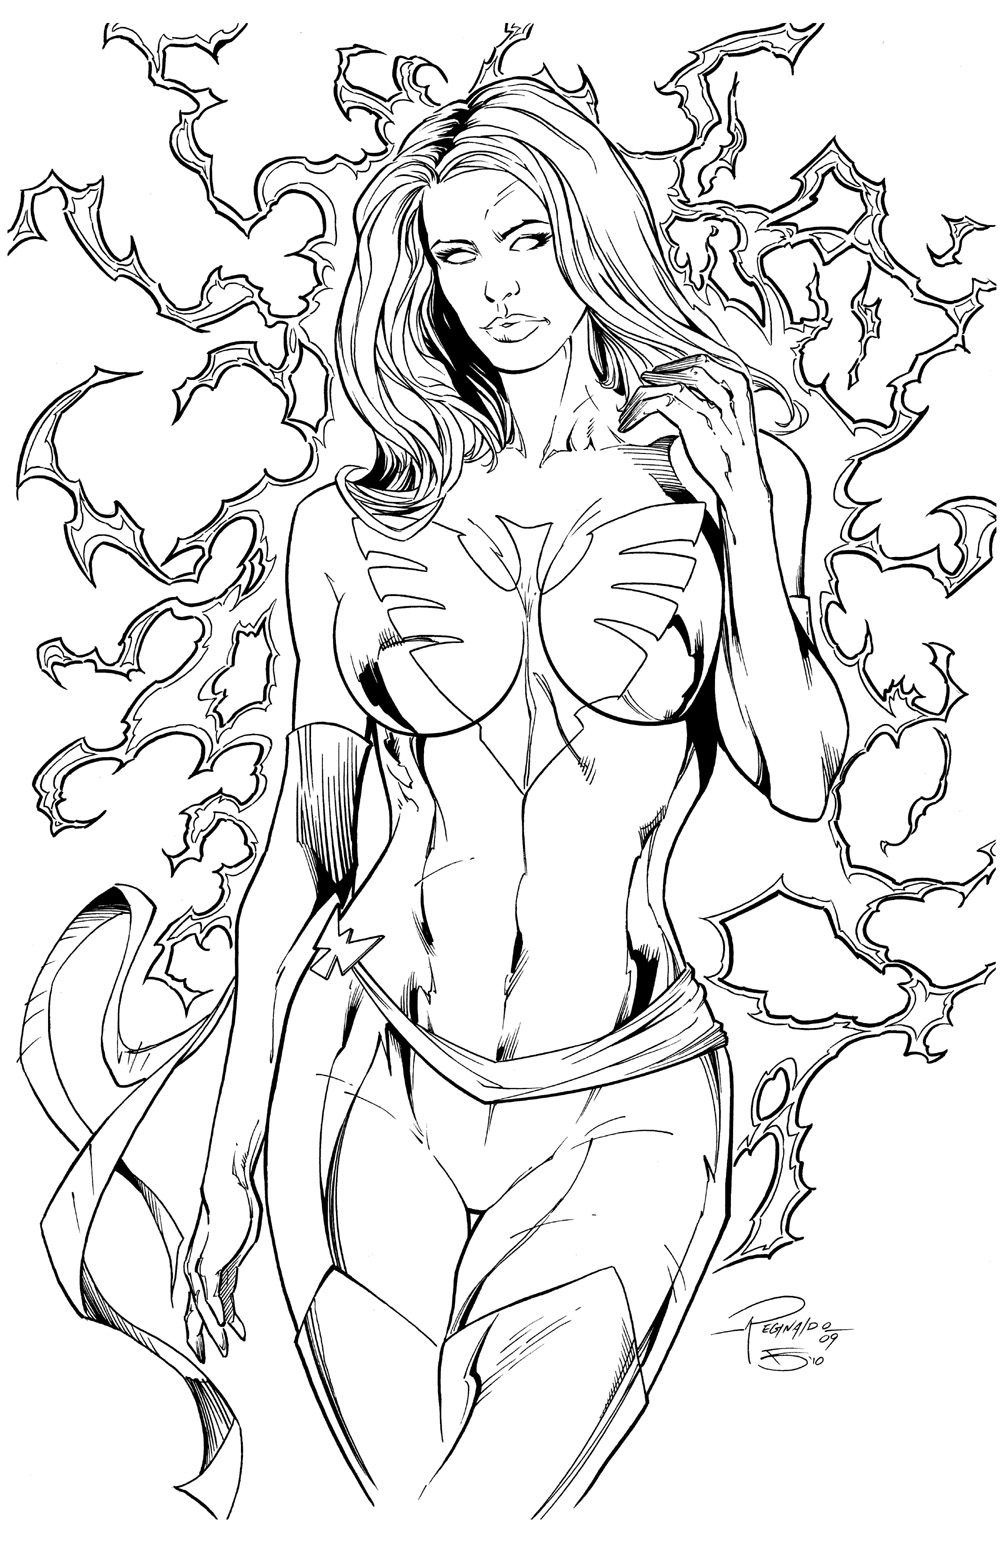 phoenix coloring pages - inks dark phoenix by fredmast on deviantart